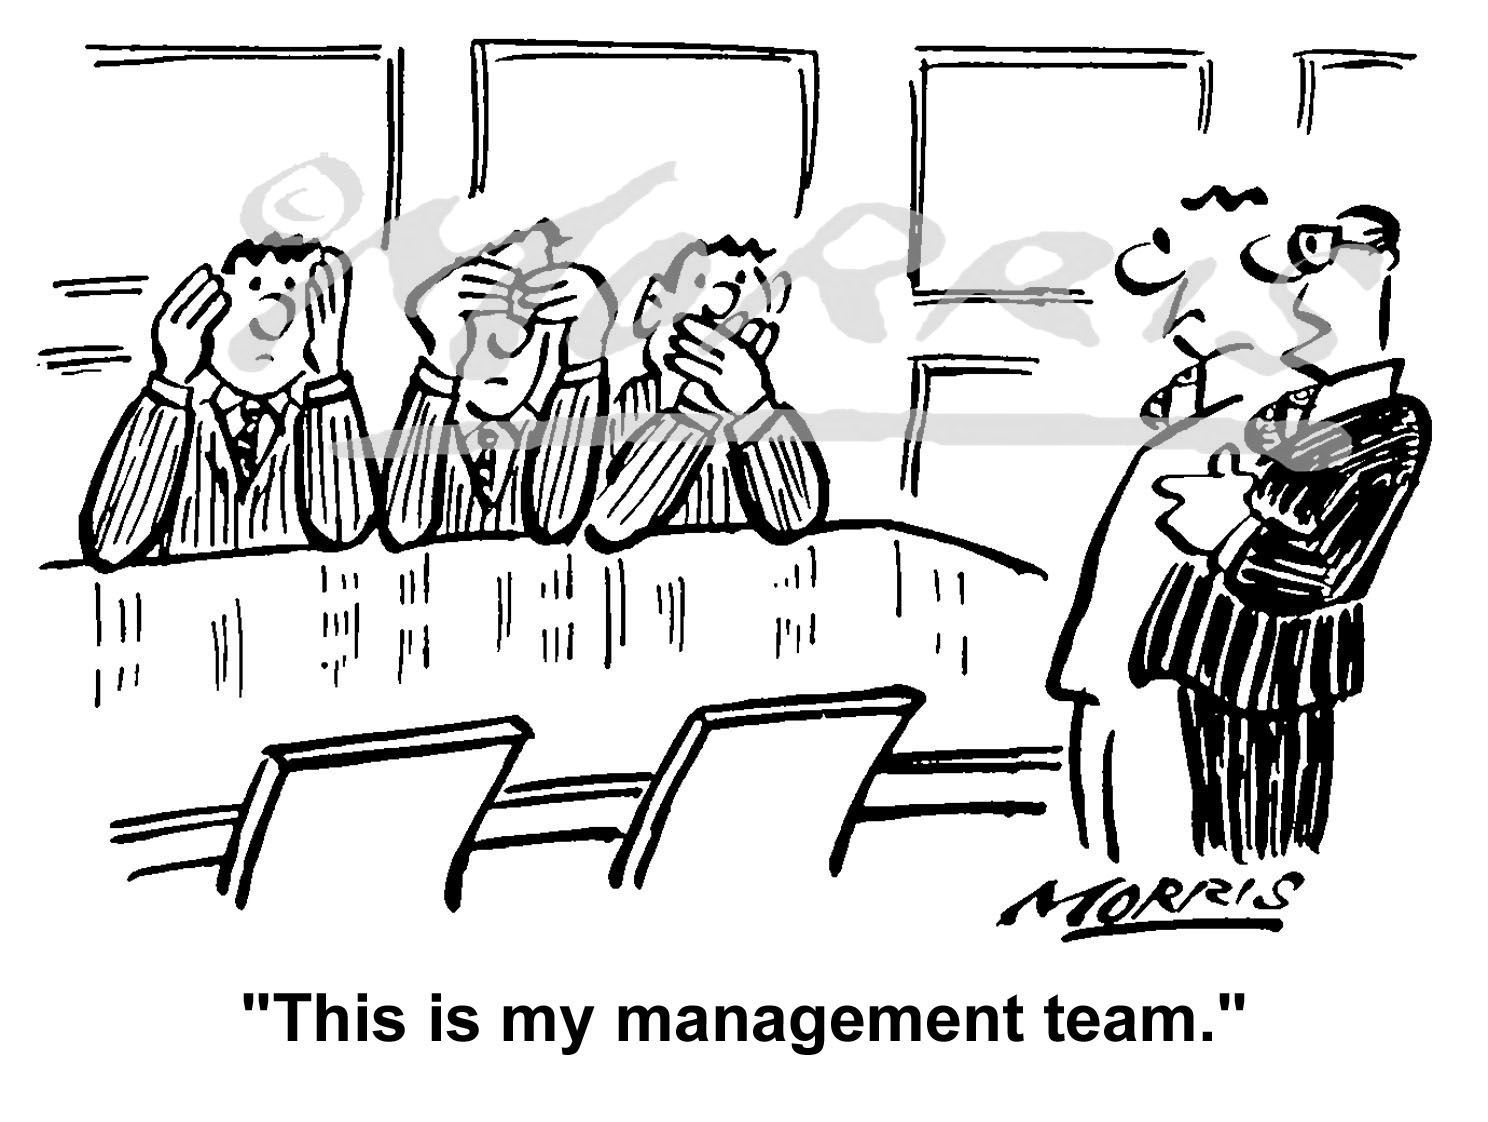 Boardroom cartoon – Ref: 1597bw